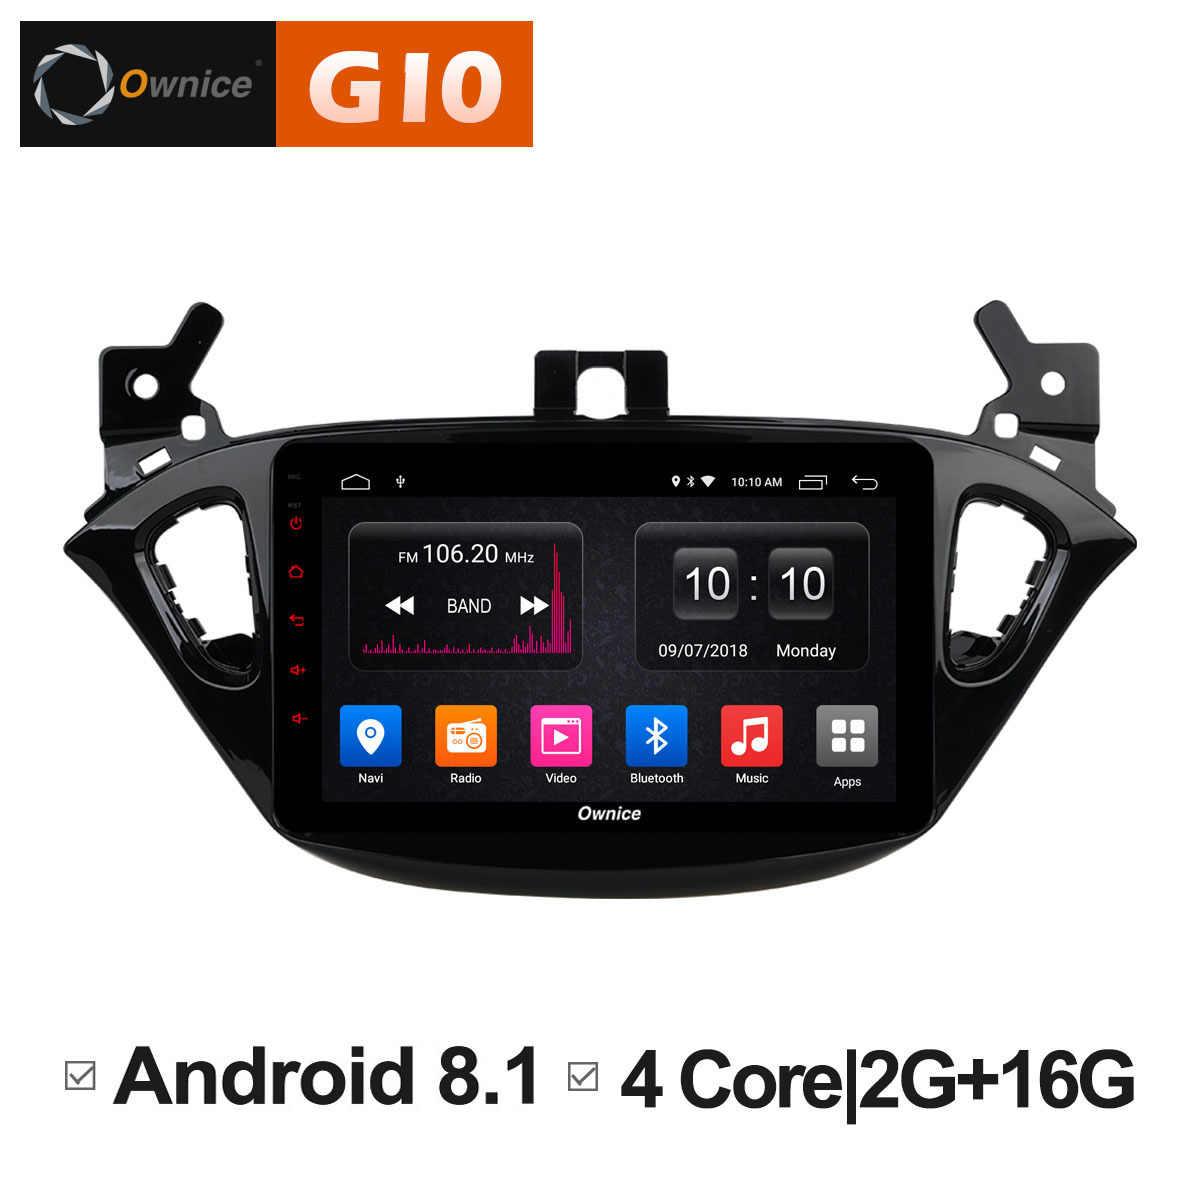 Ownice C500 + G10 Android 8.1 Octa Core Car Audio Dvd-speler voor Opel Corsa 2015 2 GB RAM Radio GPS 4G LTE WIFI BT USB 32 GB DAB +